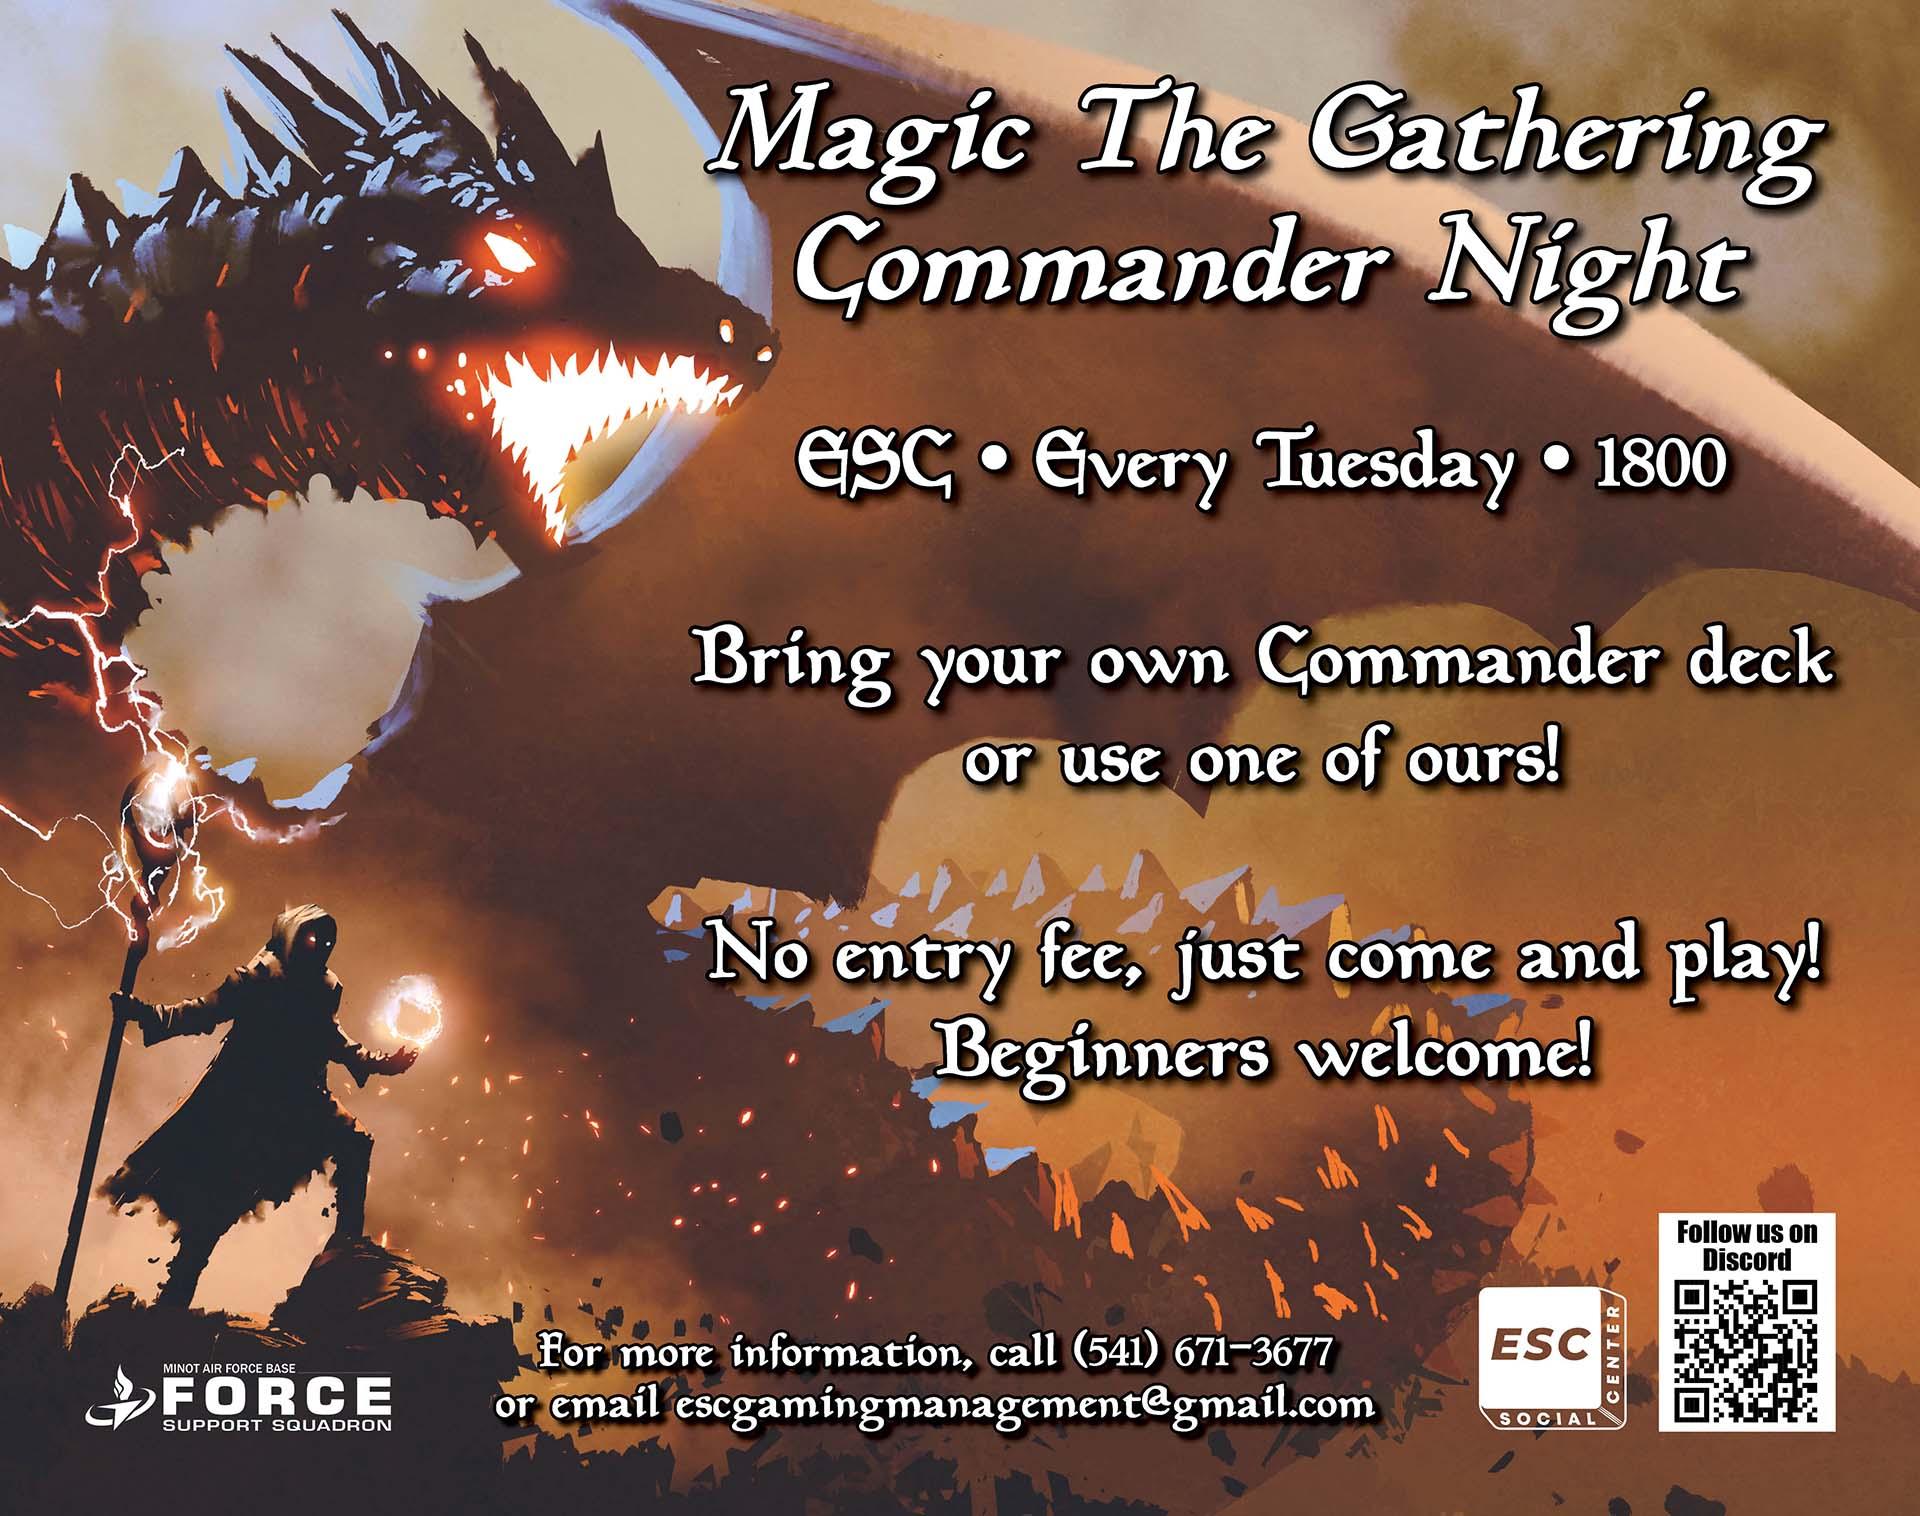 ESC - Magic the Gathering Commander Night - Tuesdays 2021